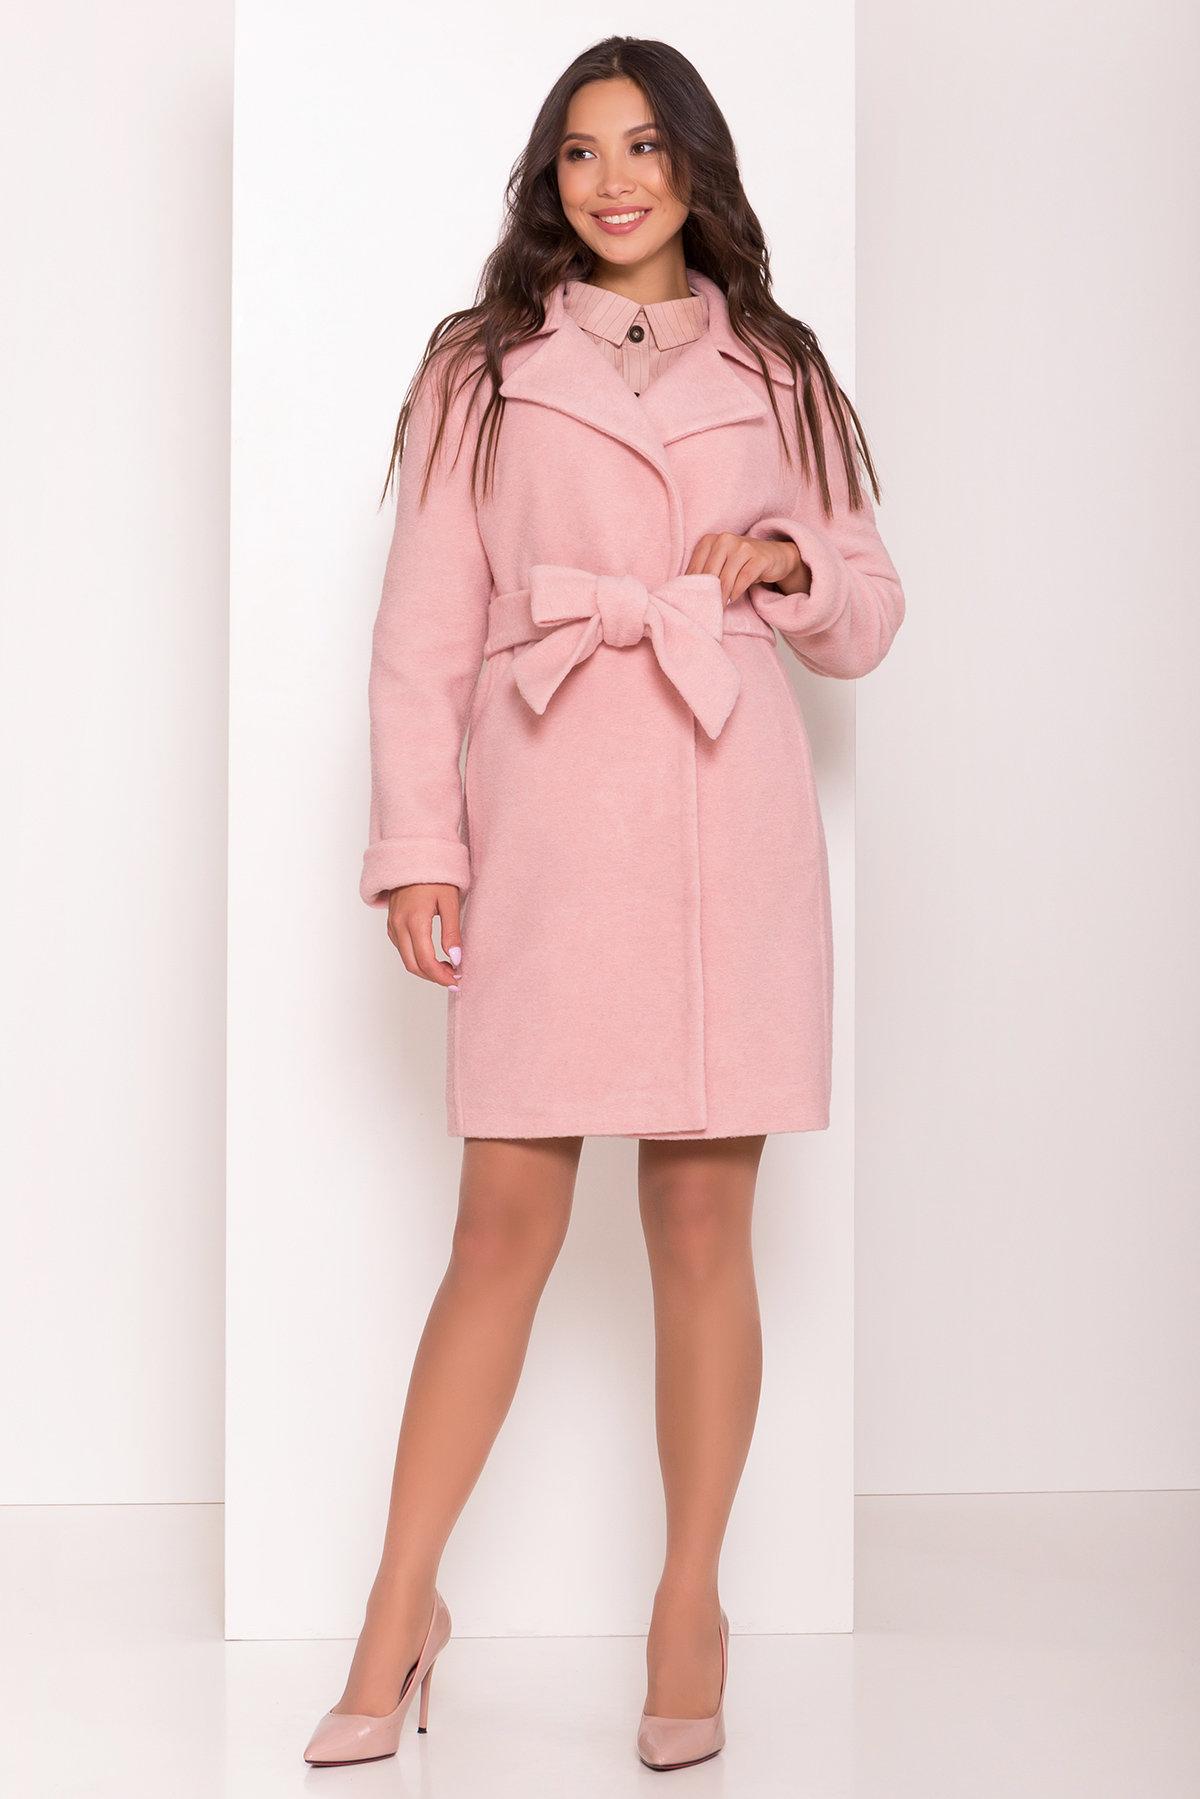 Пальто цвета нежно-розовая пудра Приора 6046 Цвет: Пудра